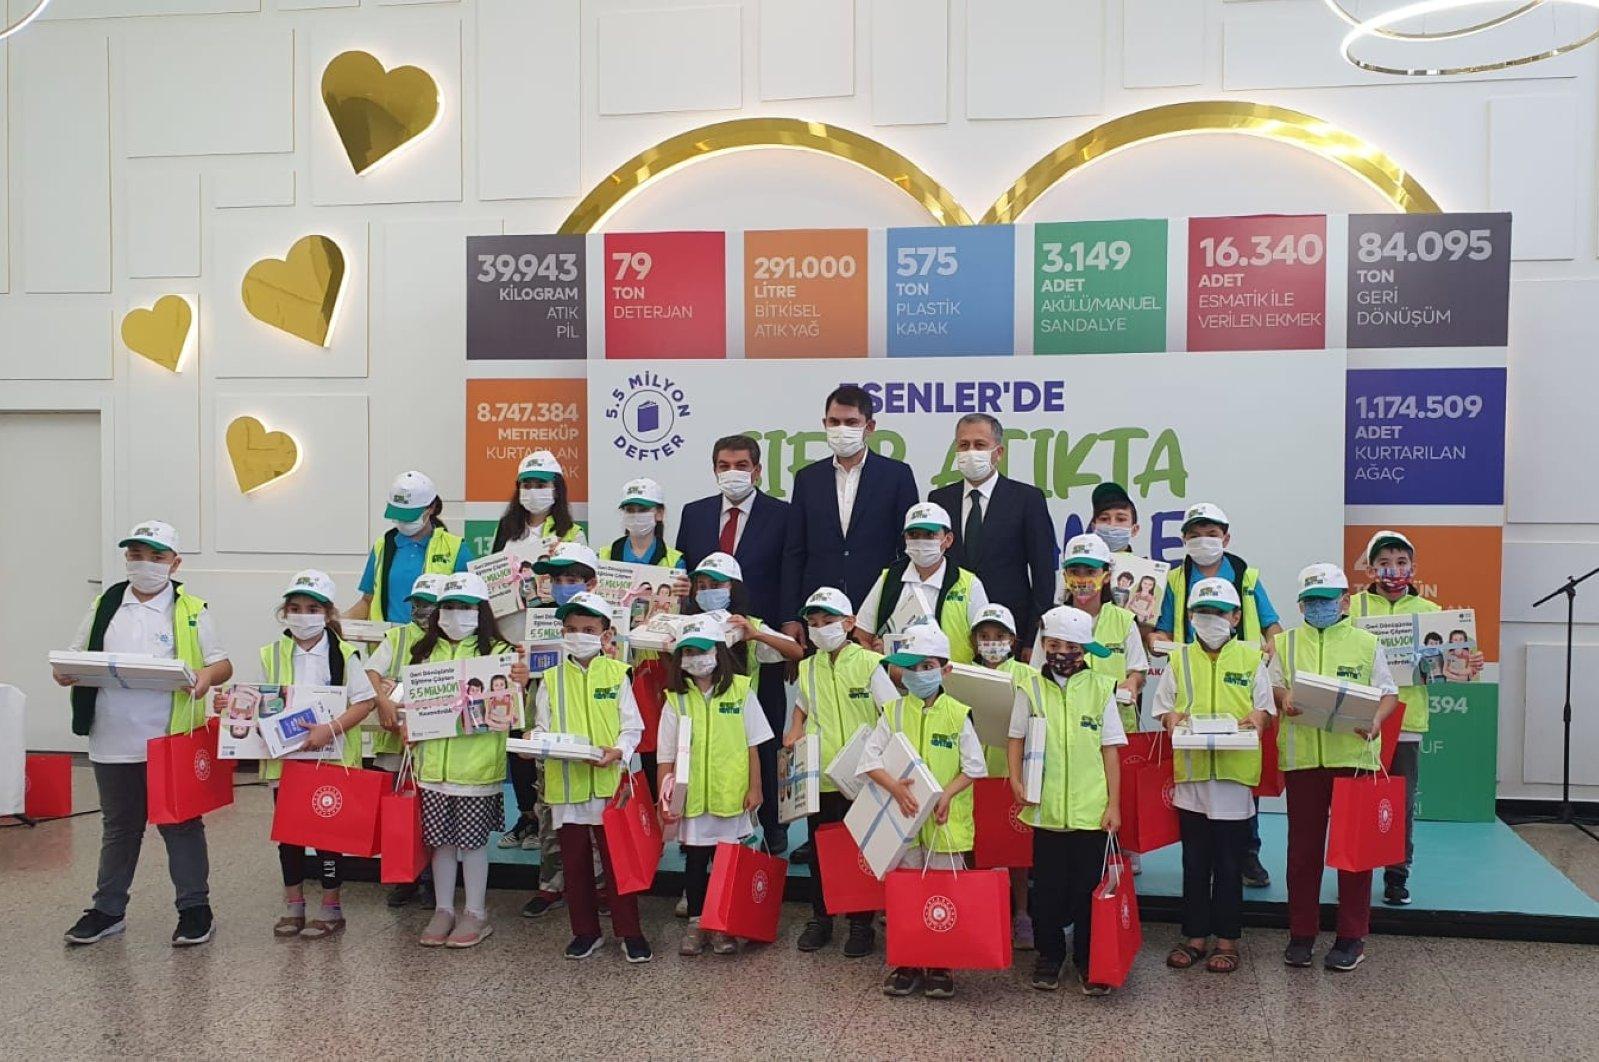 Environment and Urbanization Minister Murat Kurum, Esenler Mayor Tevfik Göksu and Istanbul Governor Ali Yerlikaya pose with children who received recycled notebooks, Istanbul, Turkey, Oct. 8, 2020. (DHA Photo)